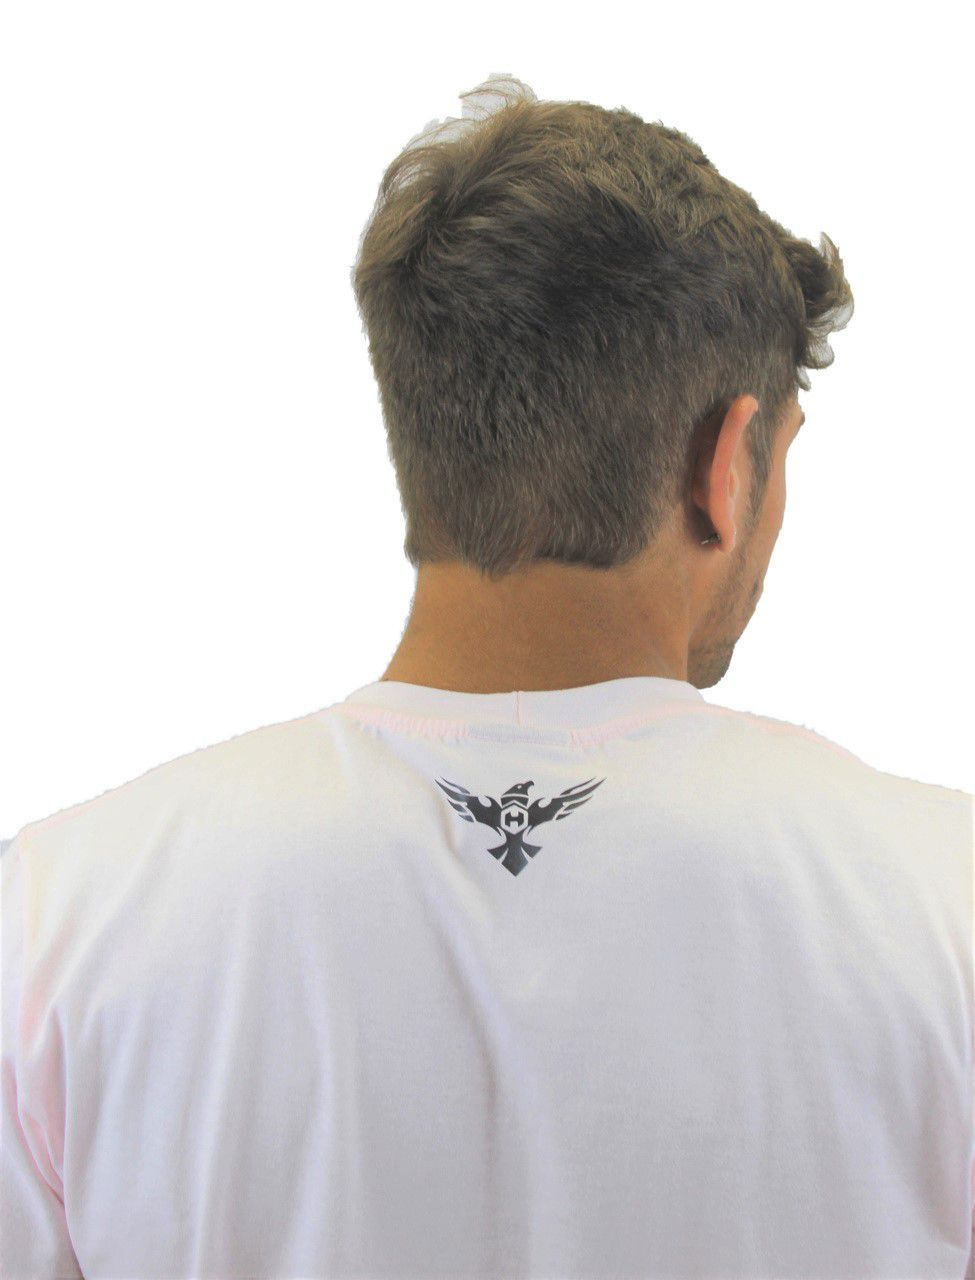 Camiseta Rosa Athleisure HOSTER Swell New